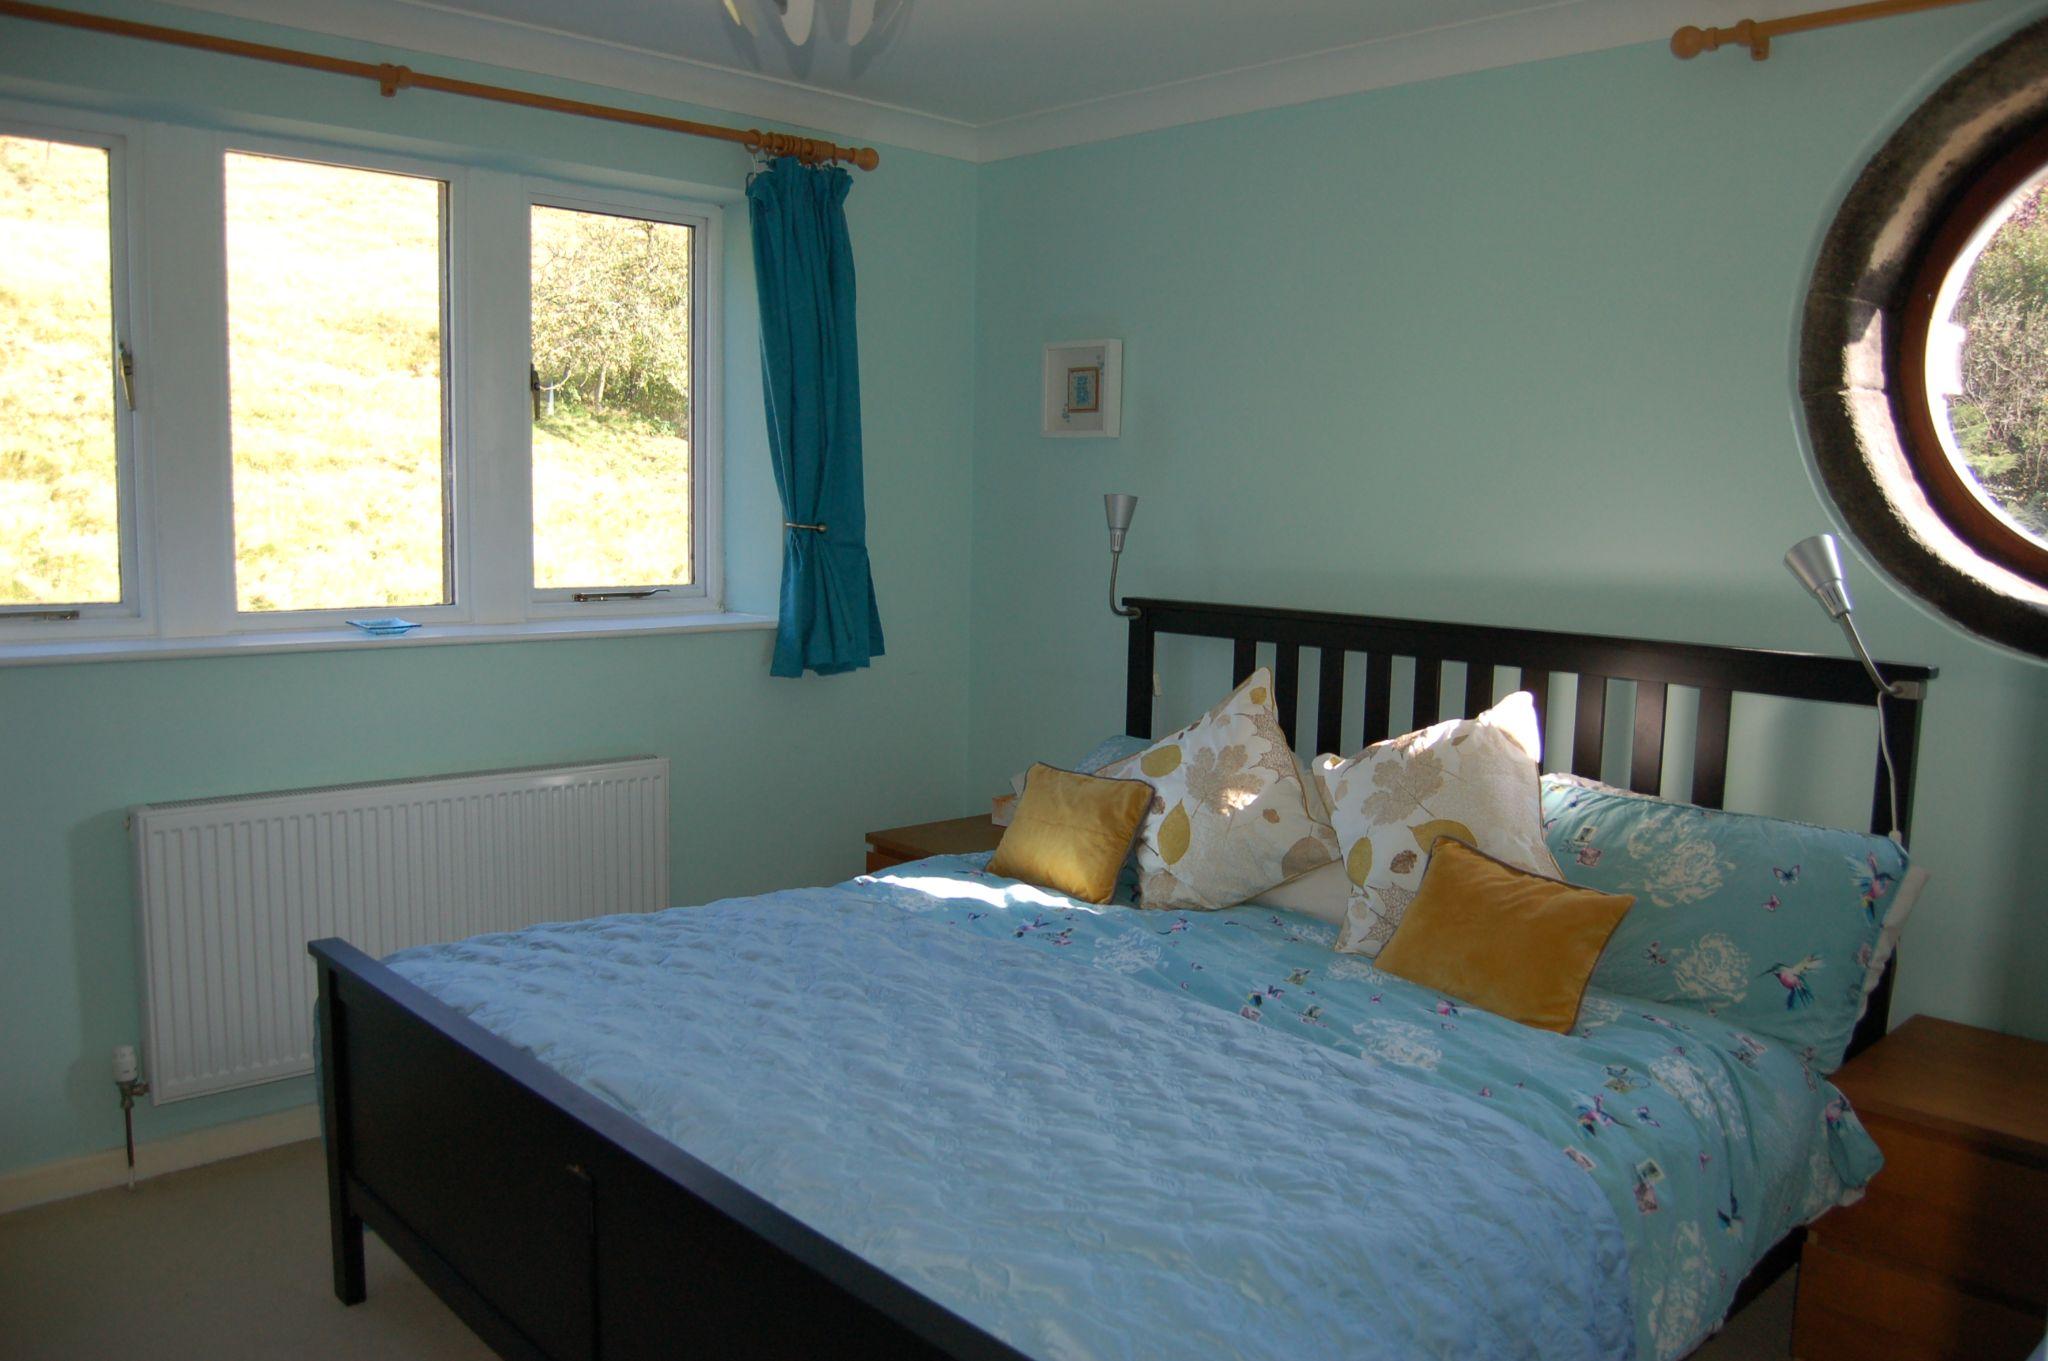 5 bedroom barn conversion house SSTC in Hebden Bridge - Photograph 13